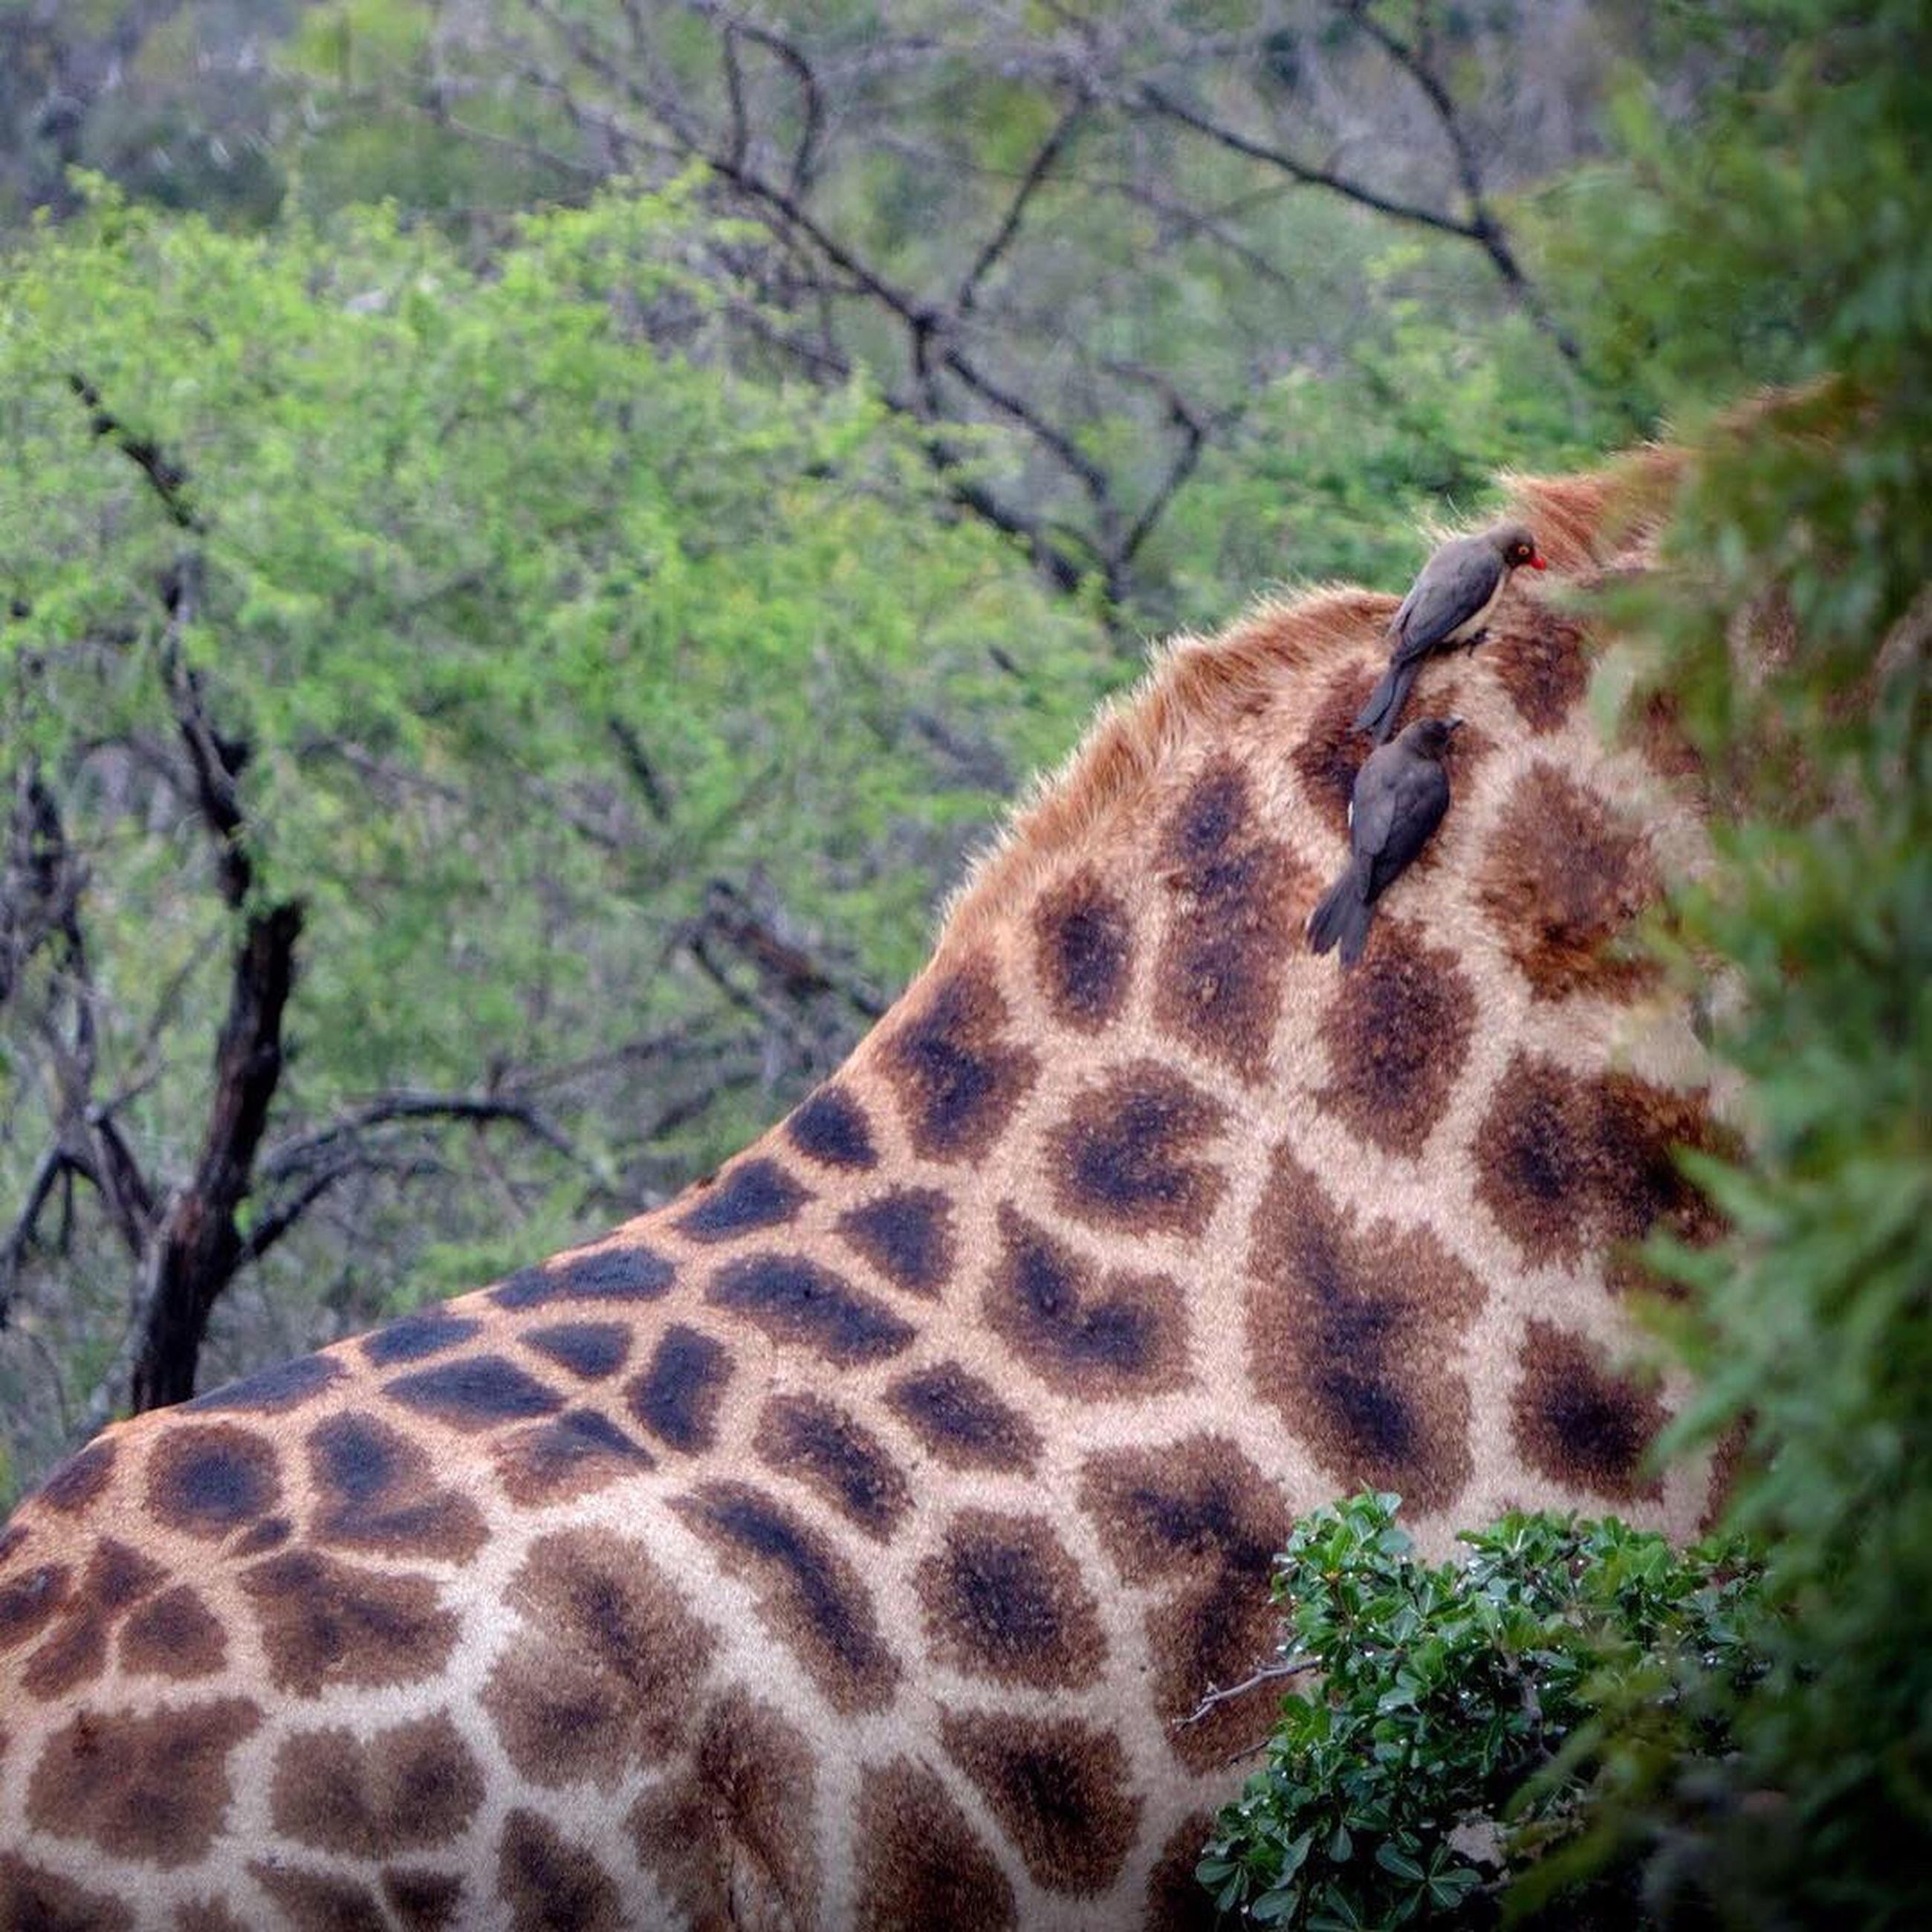 animal wildlife, animal themes, animal, animals in the wild, one animal, mammal, tree, plant, no people, safari, vertebrate, animal body part, nature, giraffe, day, forest, land, close-up, animal markings, outdoors, herbivorous, animal head, animal neck